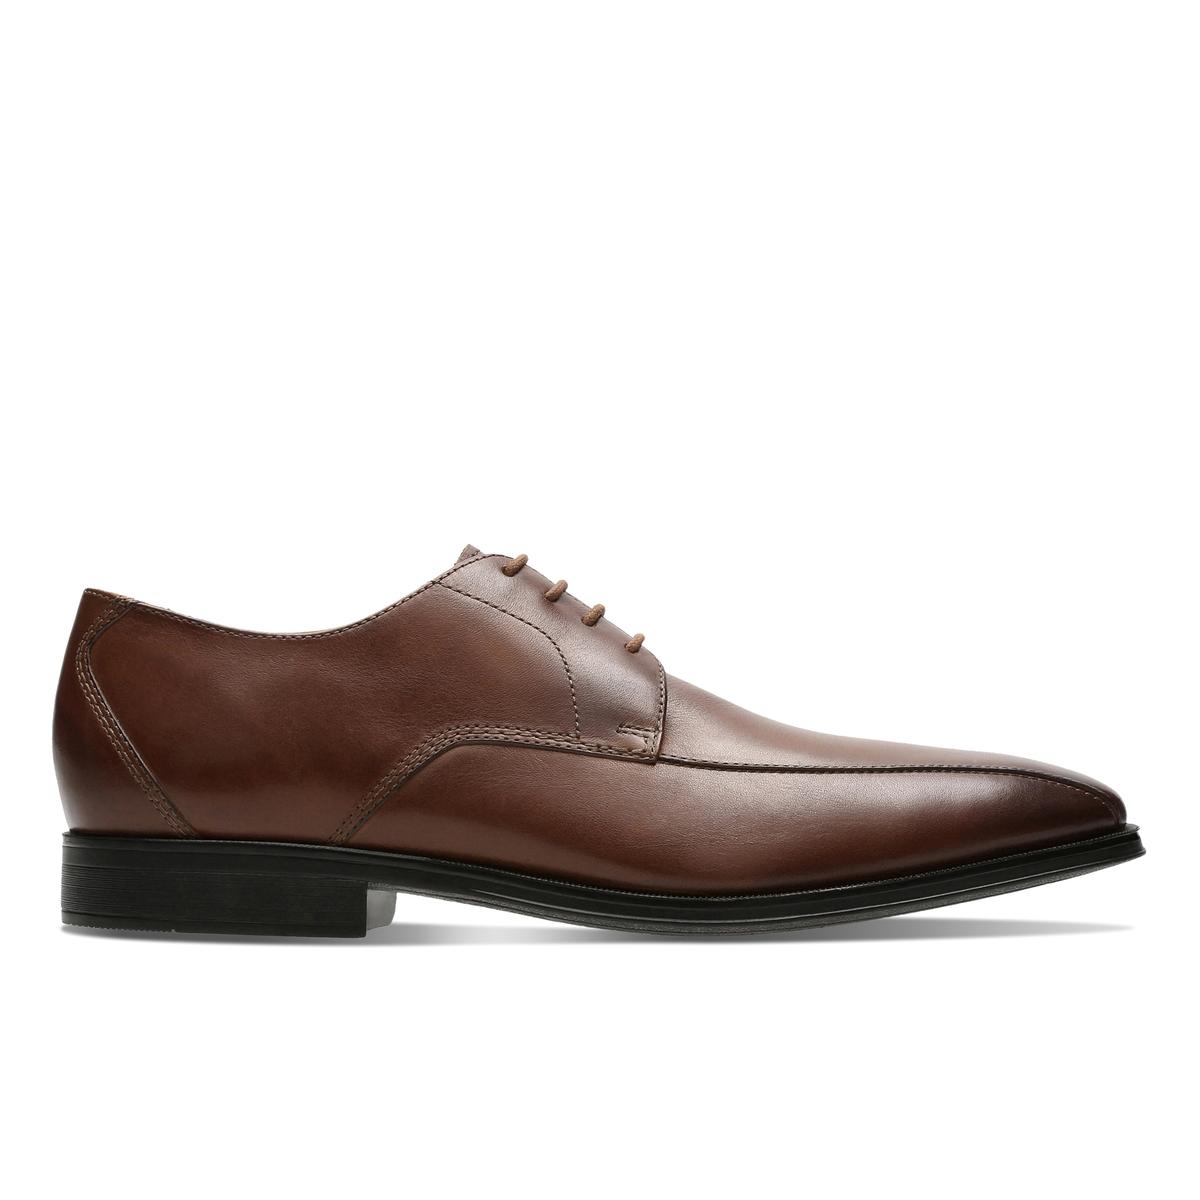 Ботинки-дерби кожаные Gilman Cap ботинки дерби clarks stafford park5 page 8